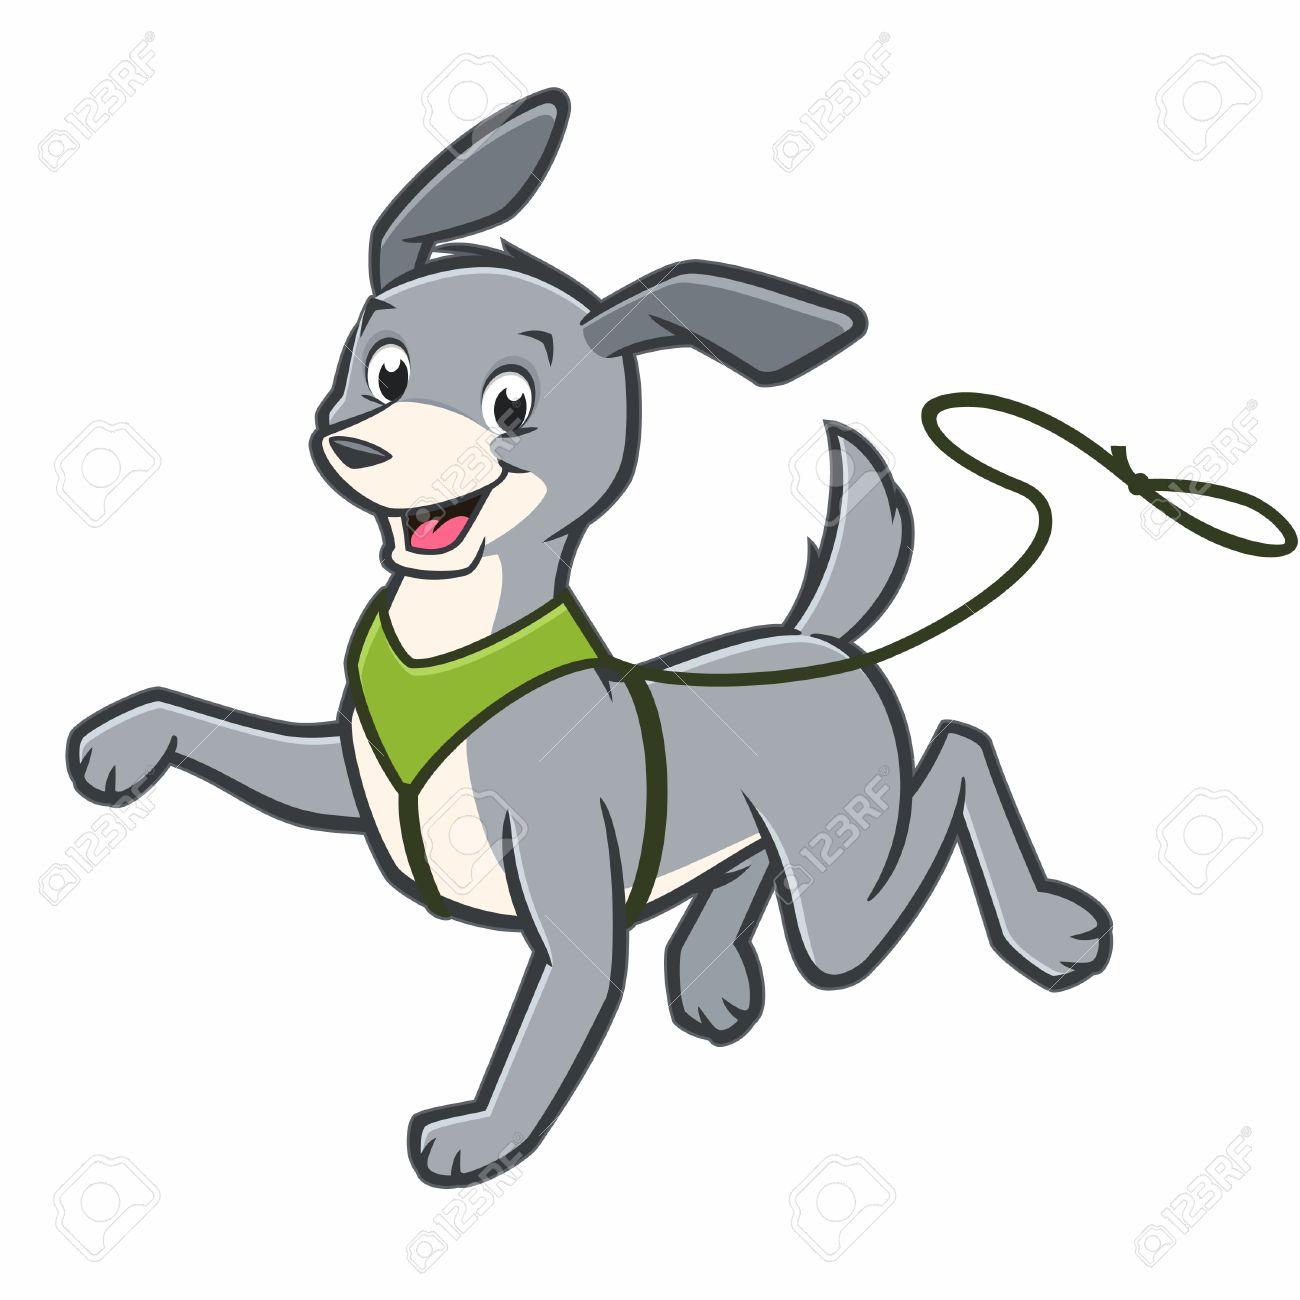 Vector Cartoon Happy Dog Walking On Leash Royalty Free Cliparts Vectors And Stock Illustration Image 69151193